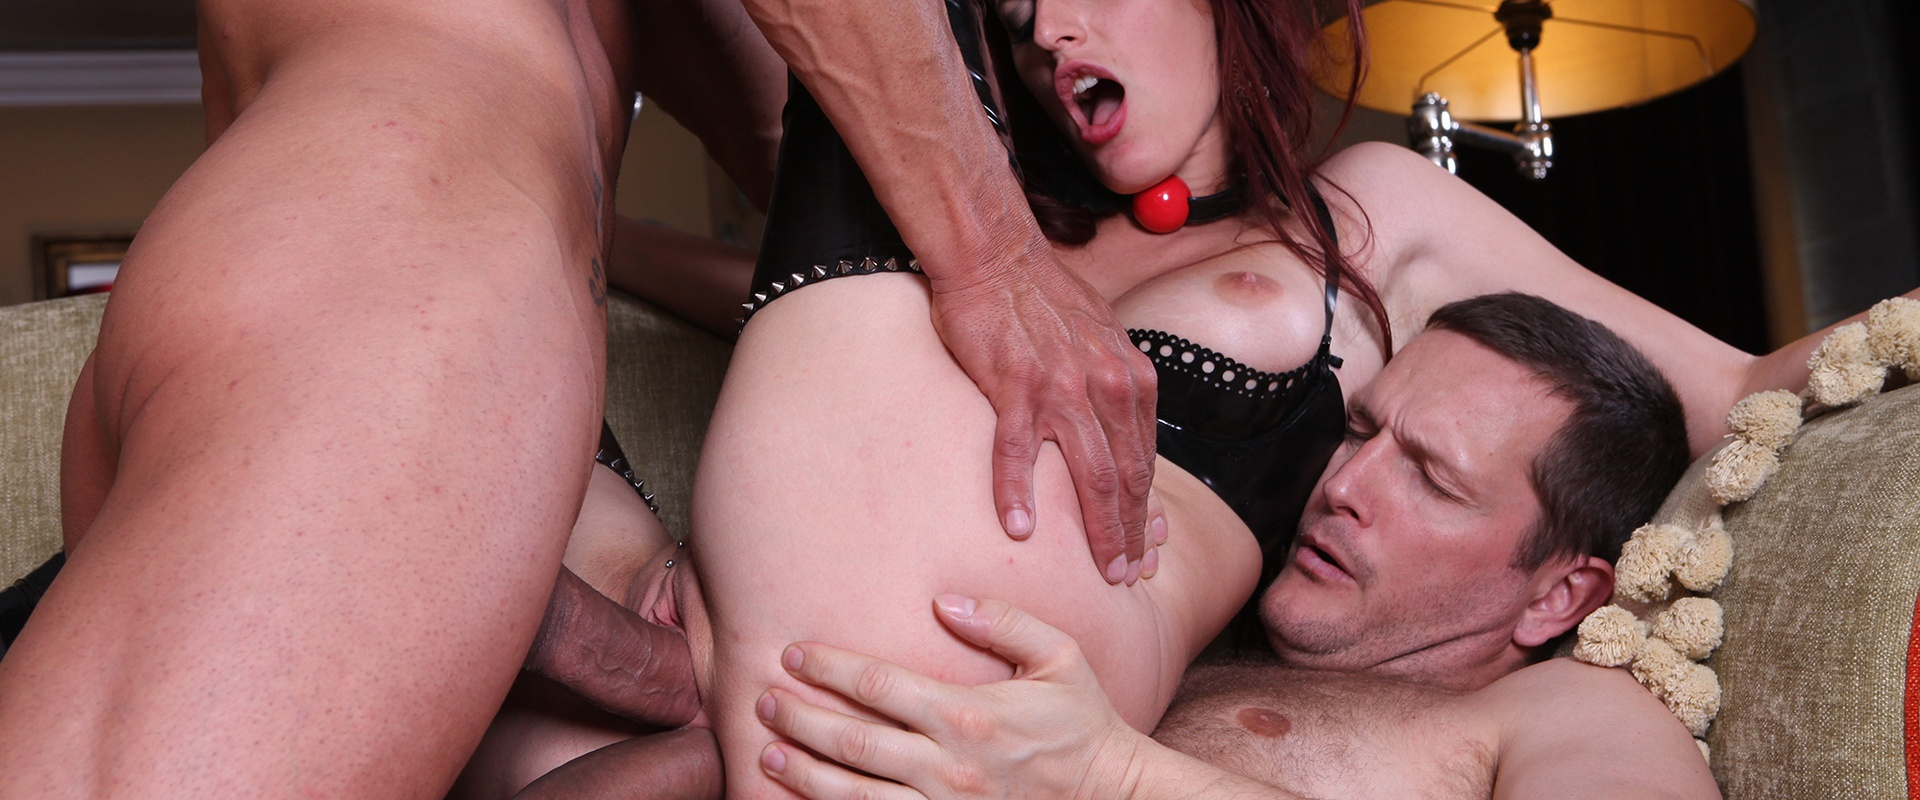 Redhead MILF seduces her two servants